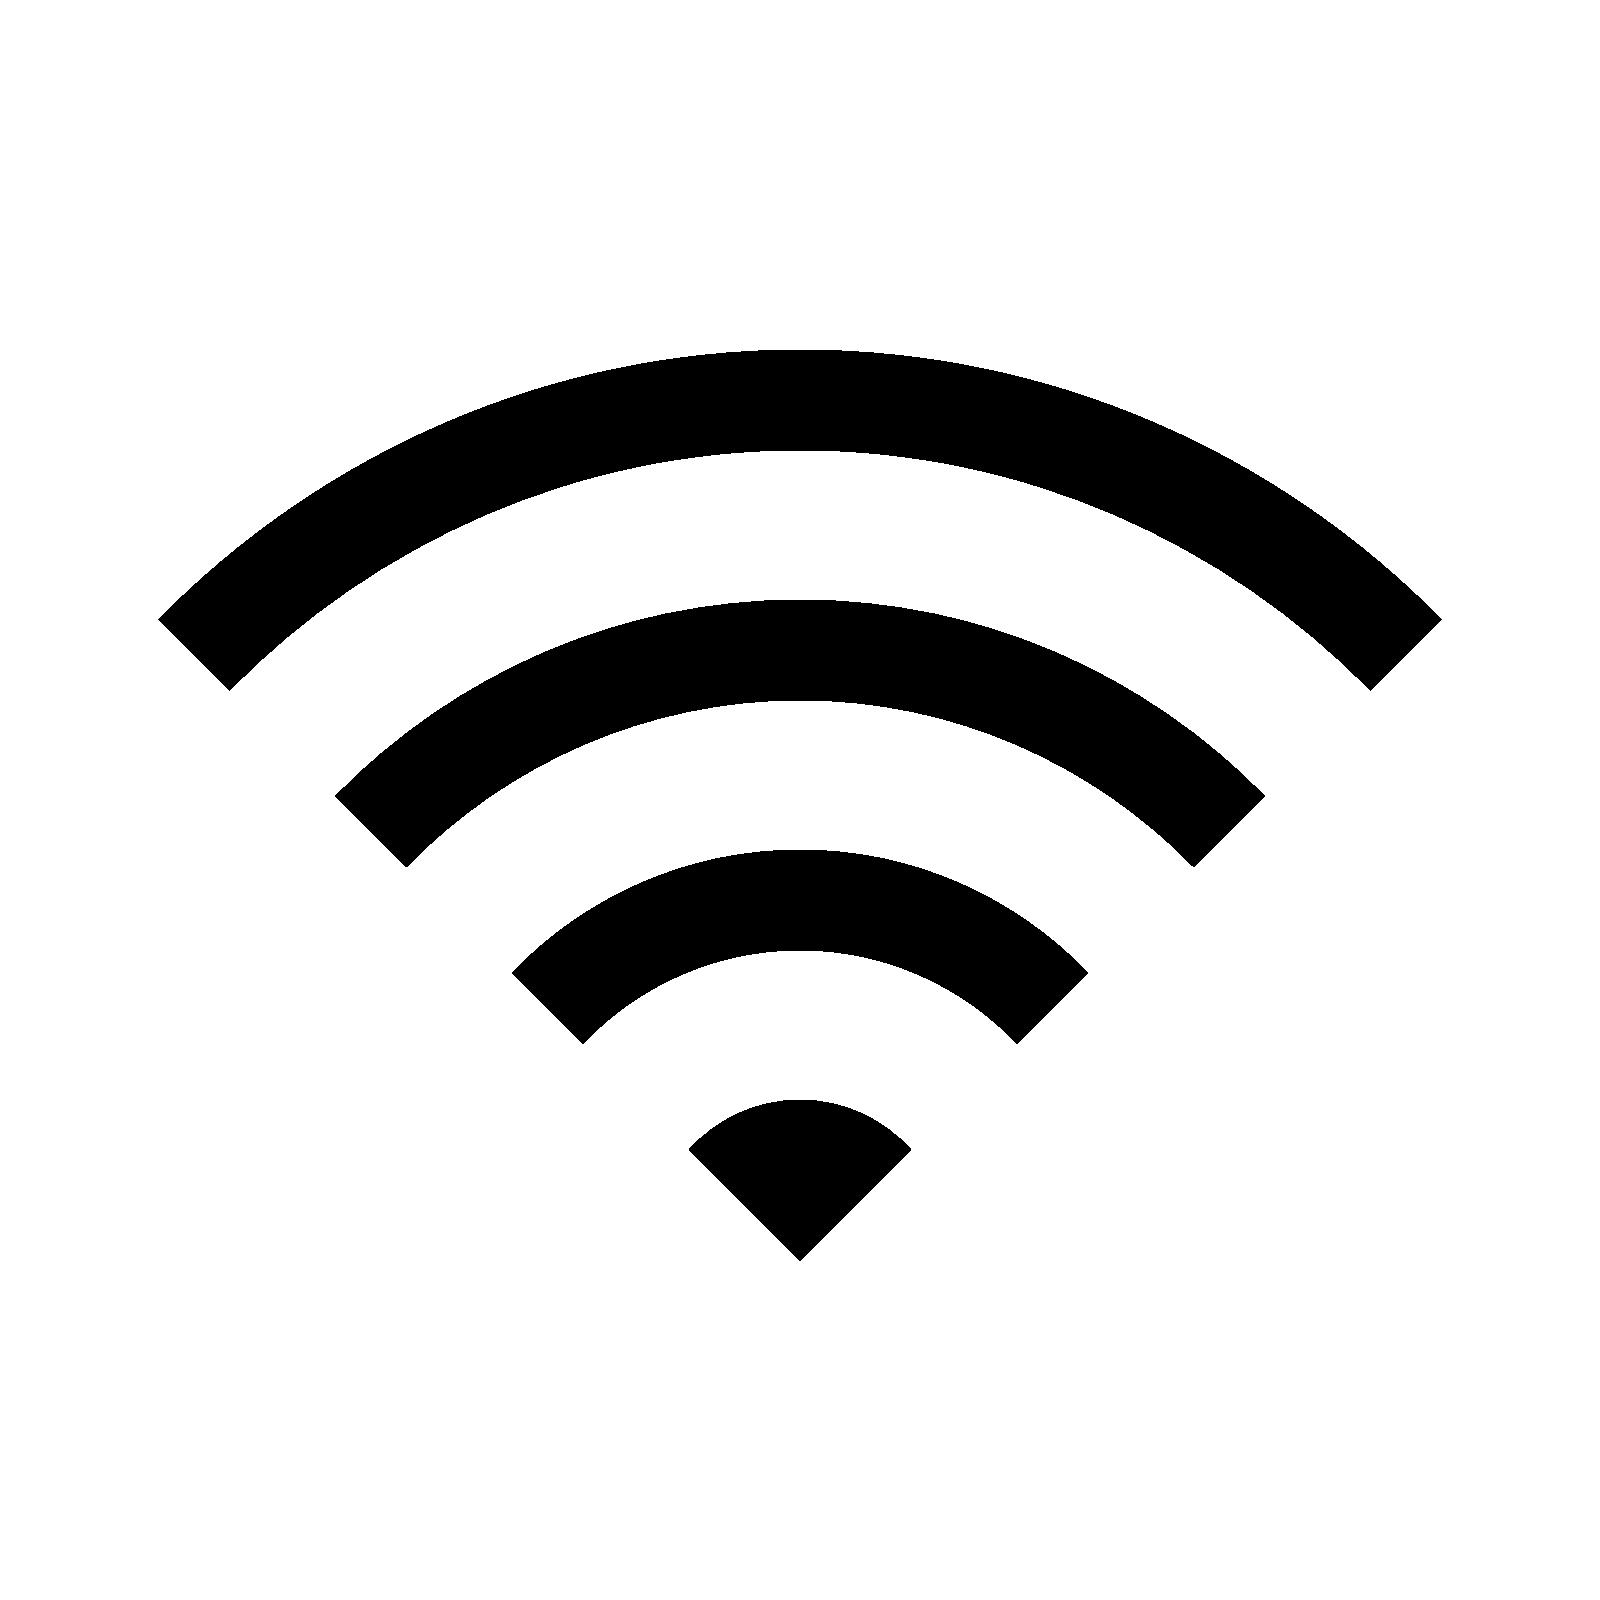 Wifi PNG - 18472